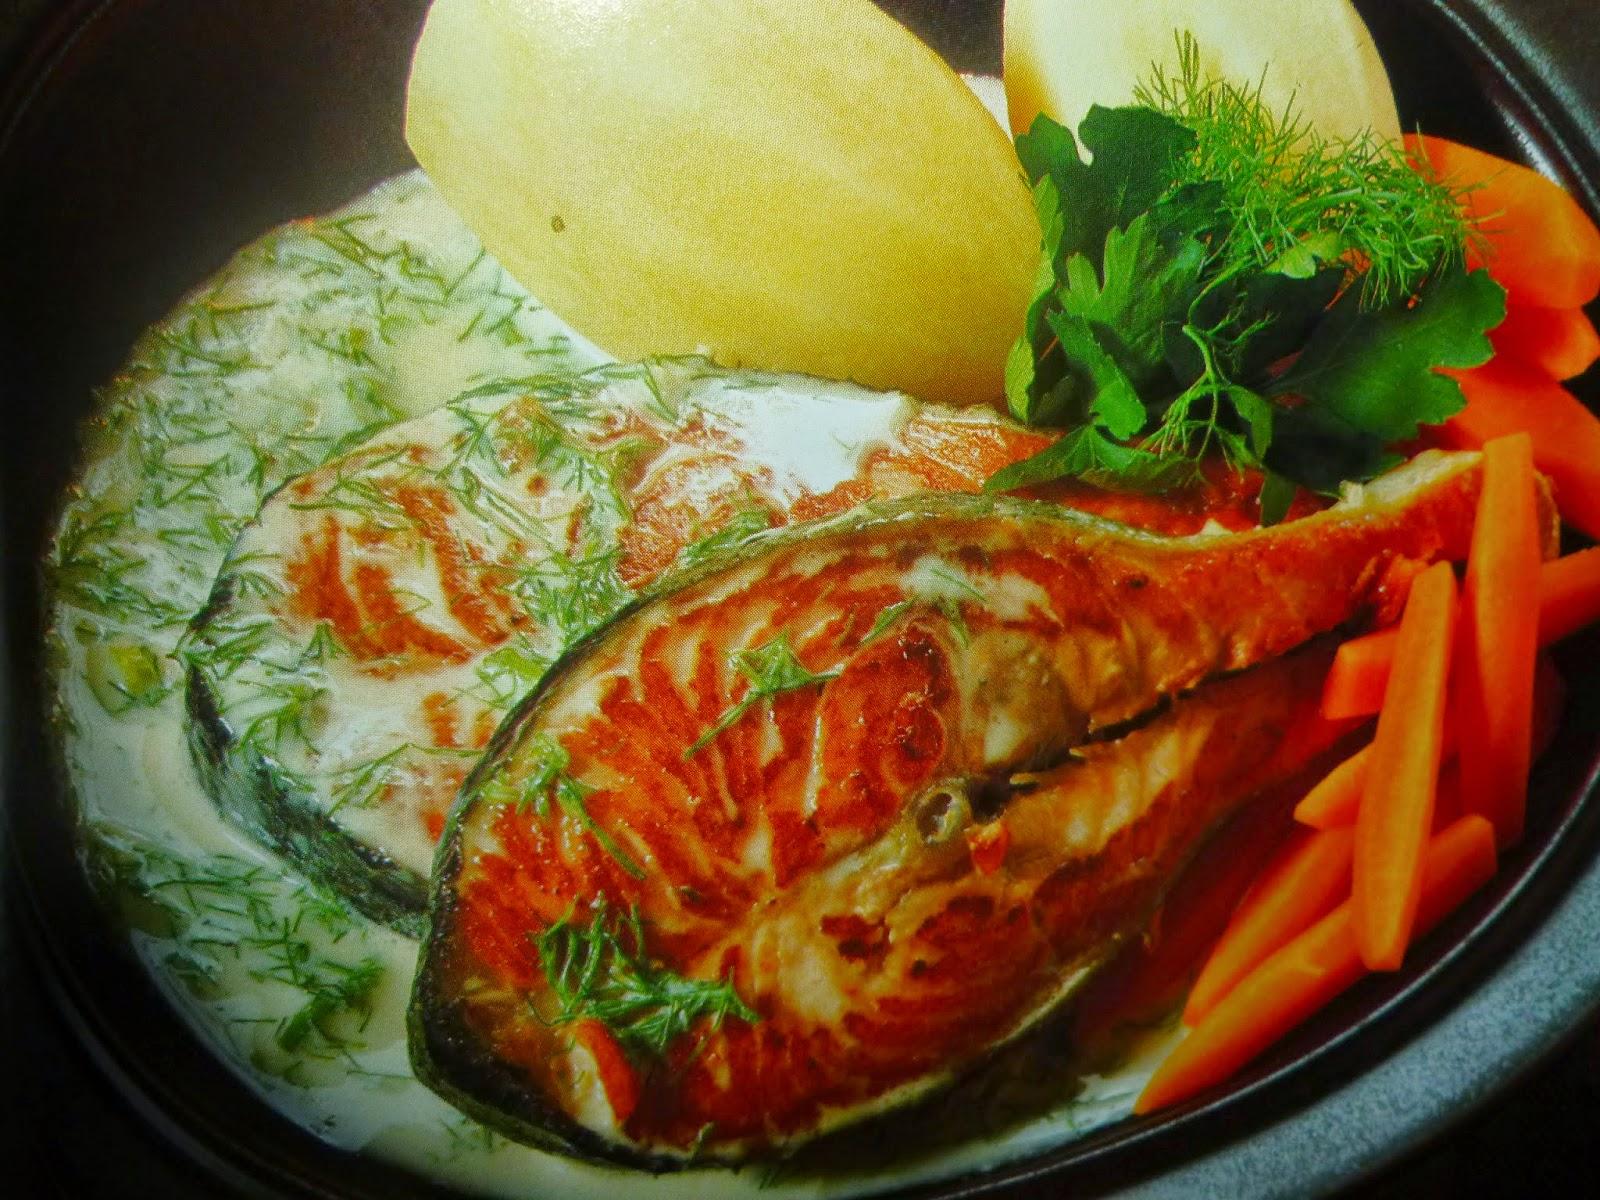 Salmone all 39 aneto la cucina norvegese for Cucina norvegese